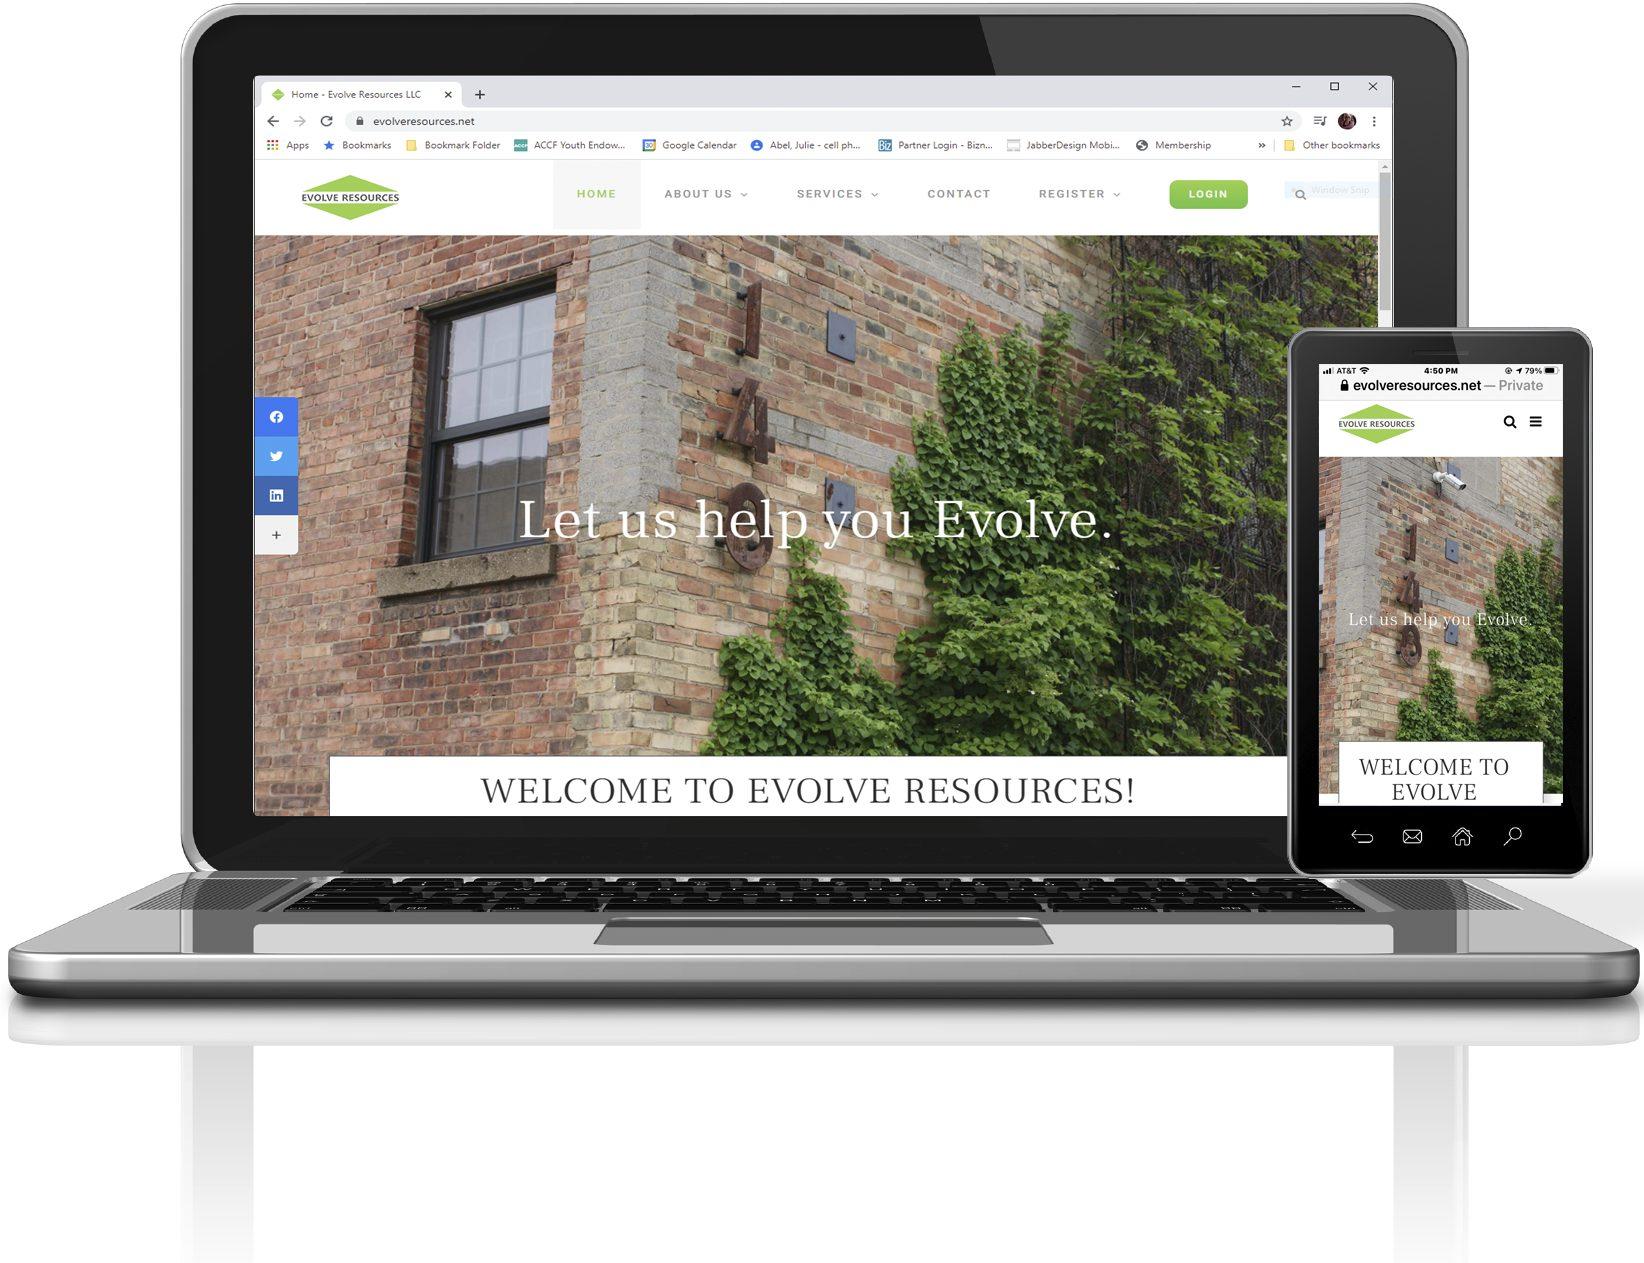 Evolve Resources Mobile Friendly Website by JabberDesign